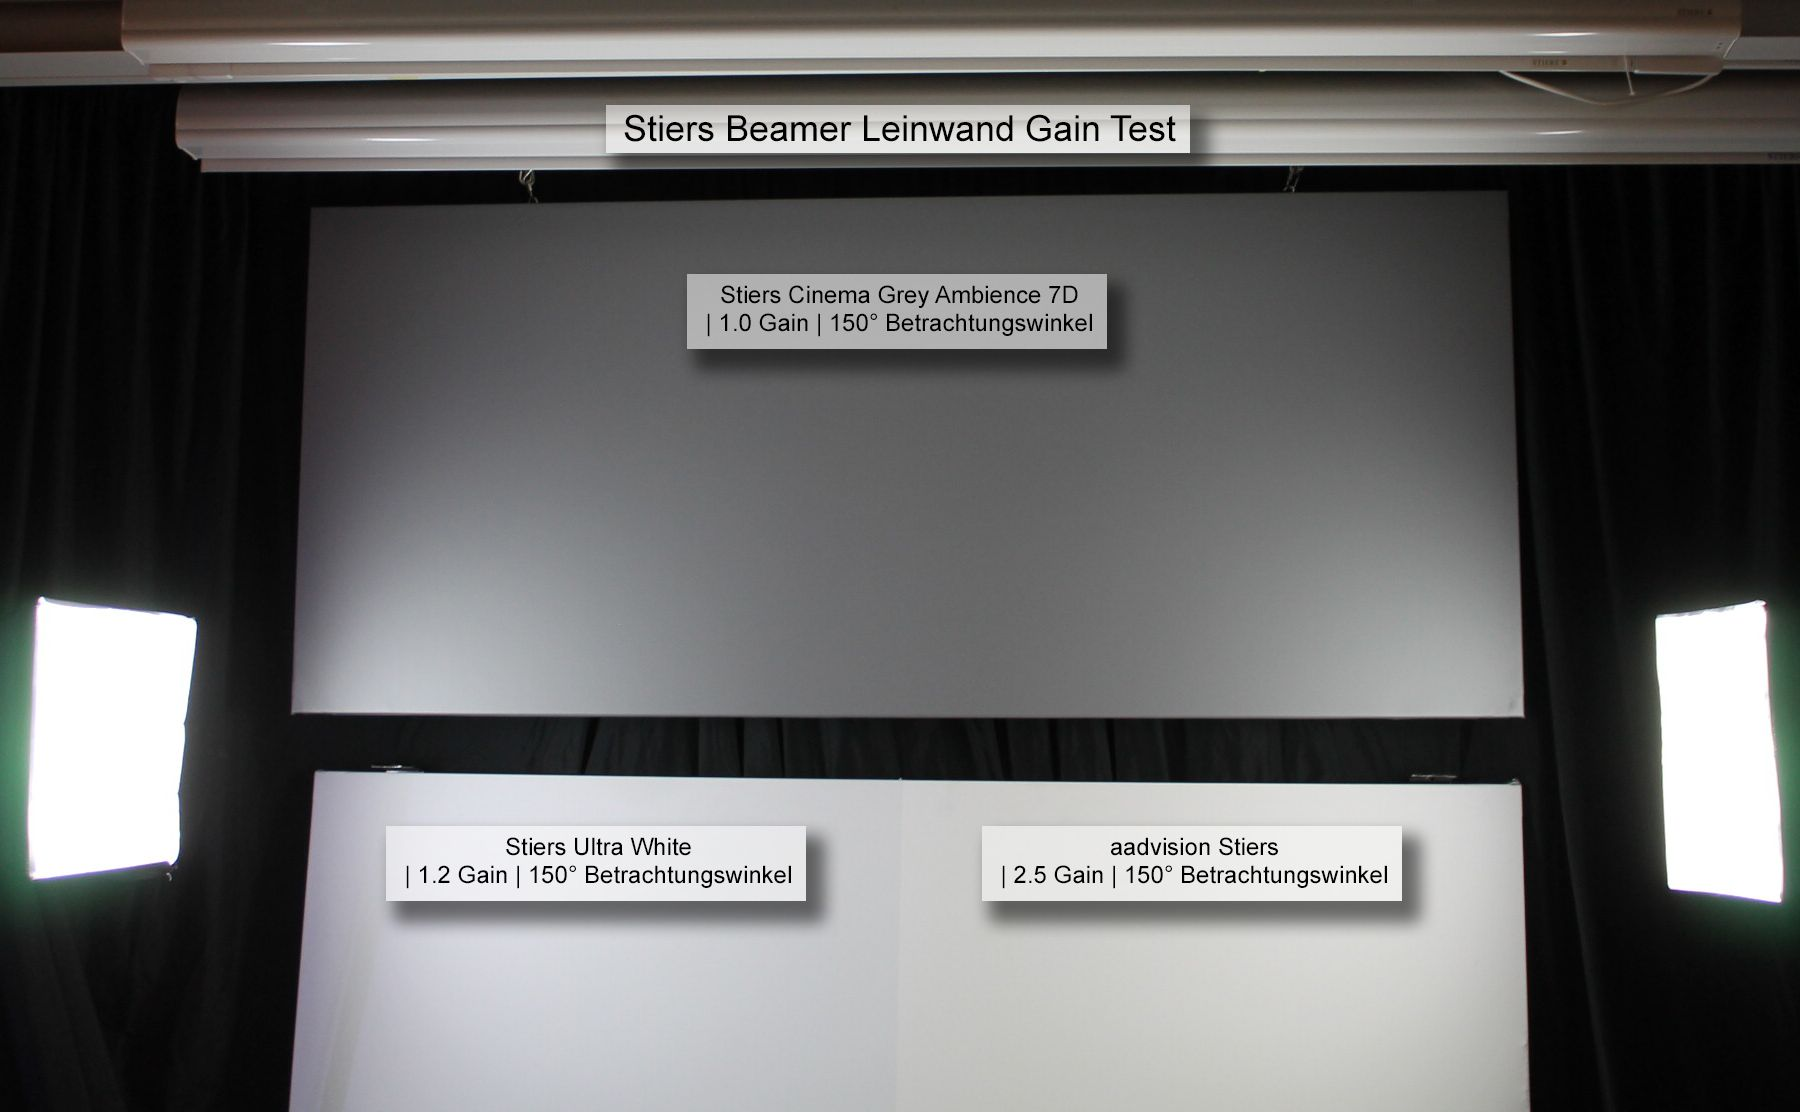 Motorleinwand Hersteller Beamer Projektionsleinwand